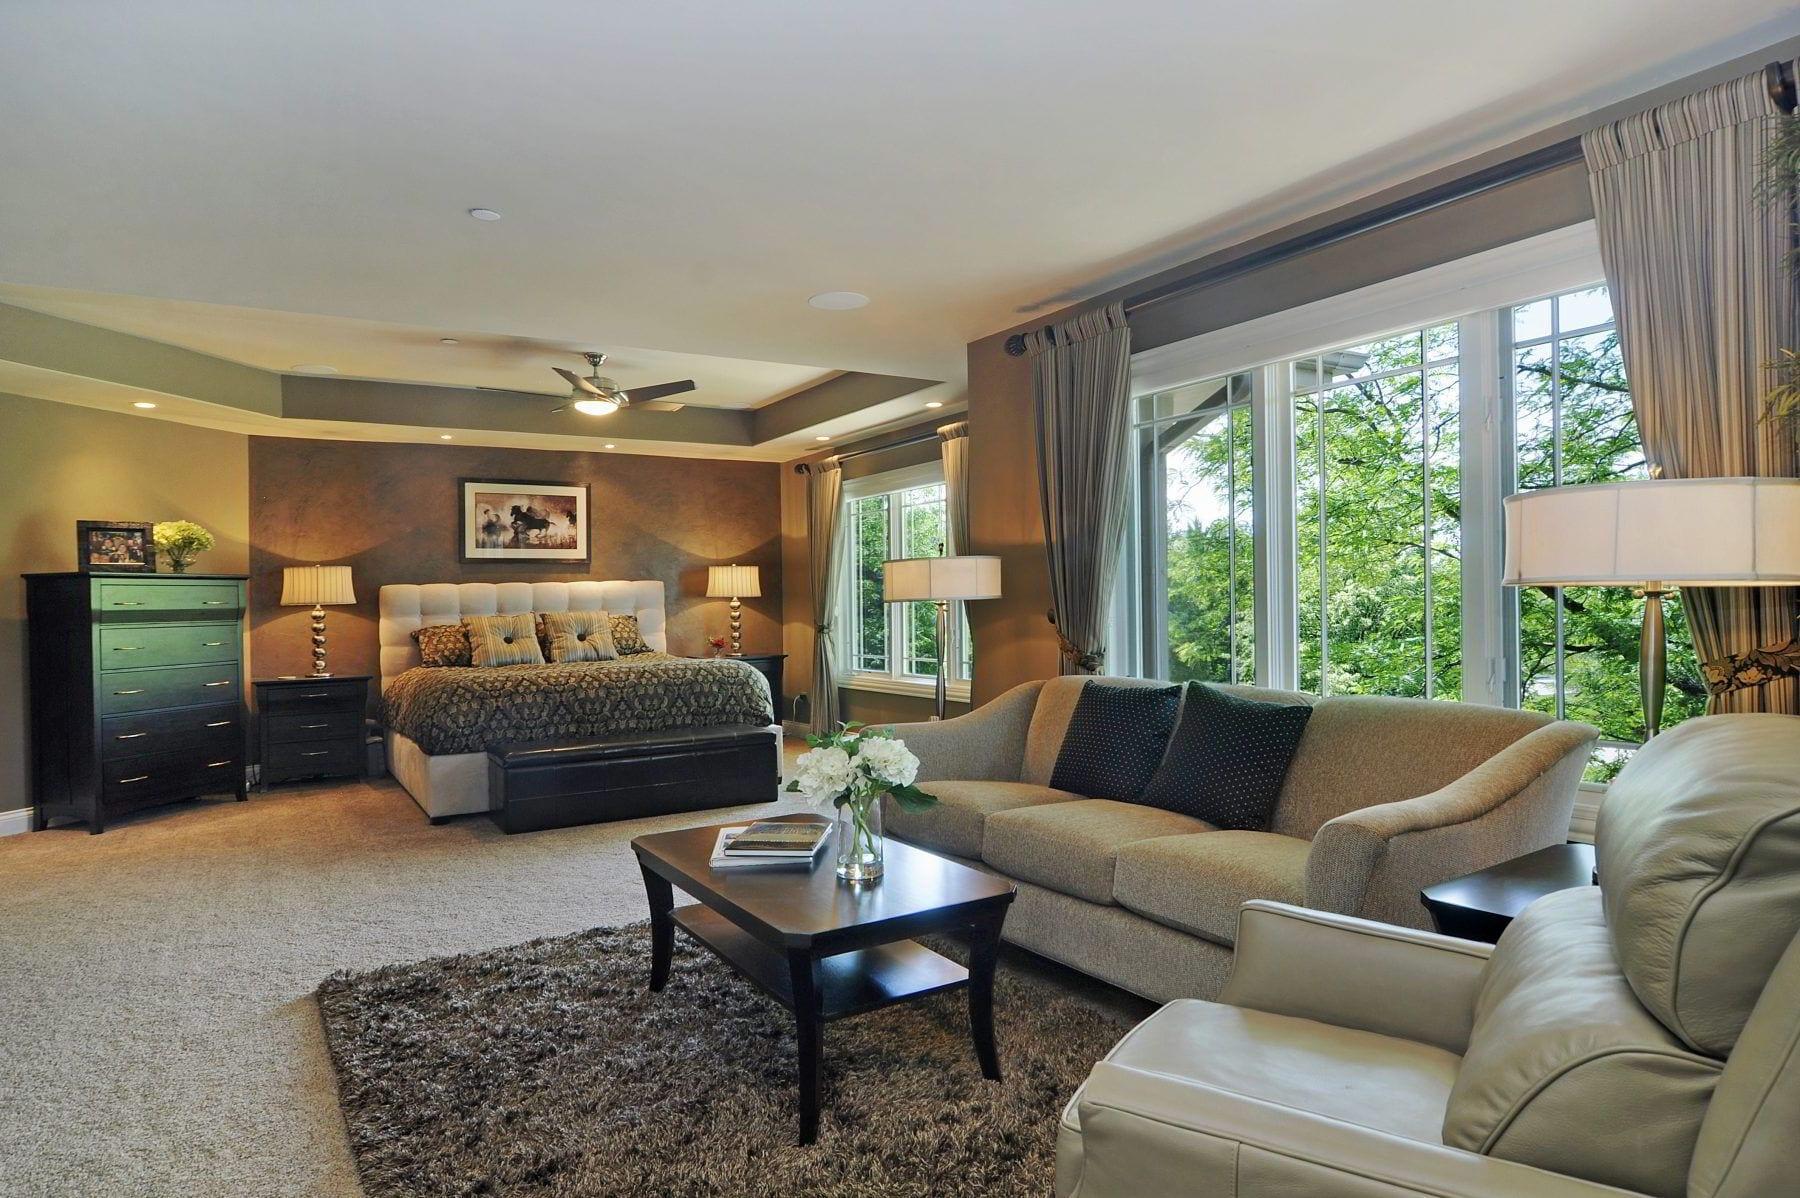 chicago interior designer expert consultation custom home remodeling and home furnishings prevnext